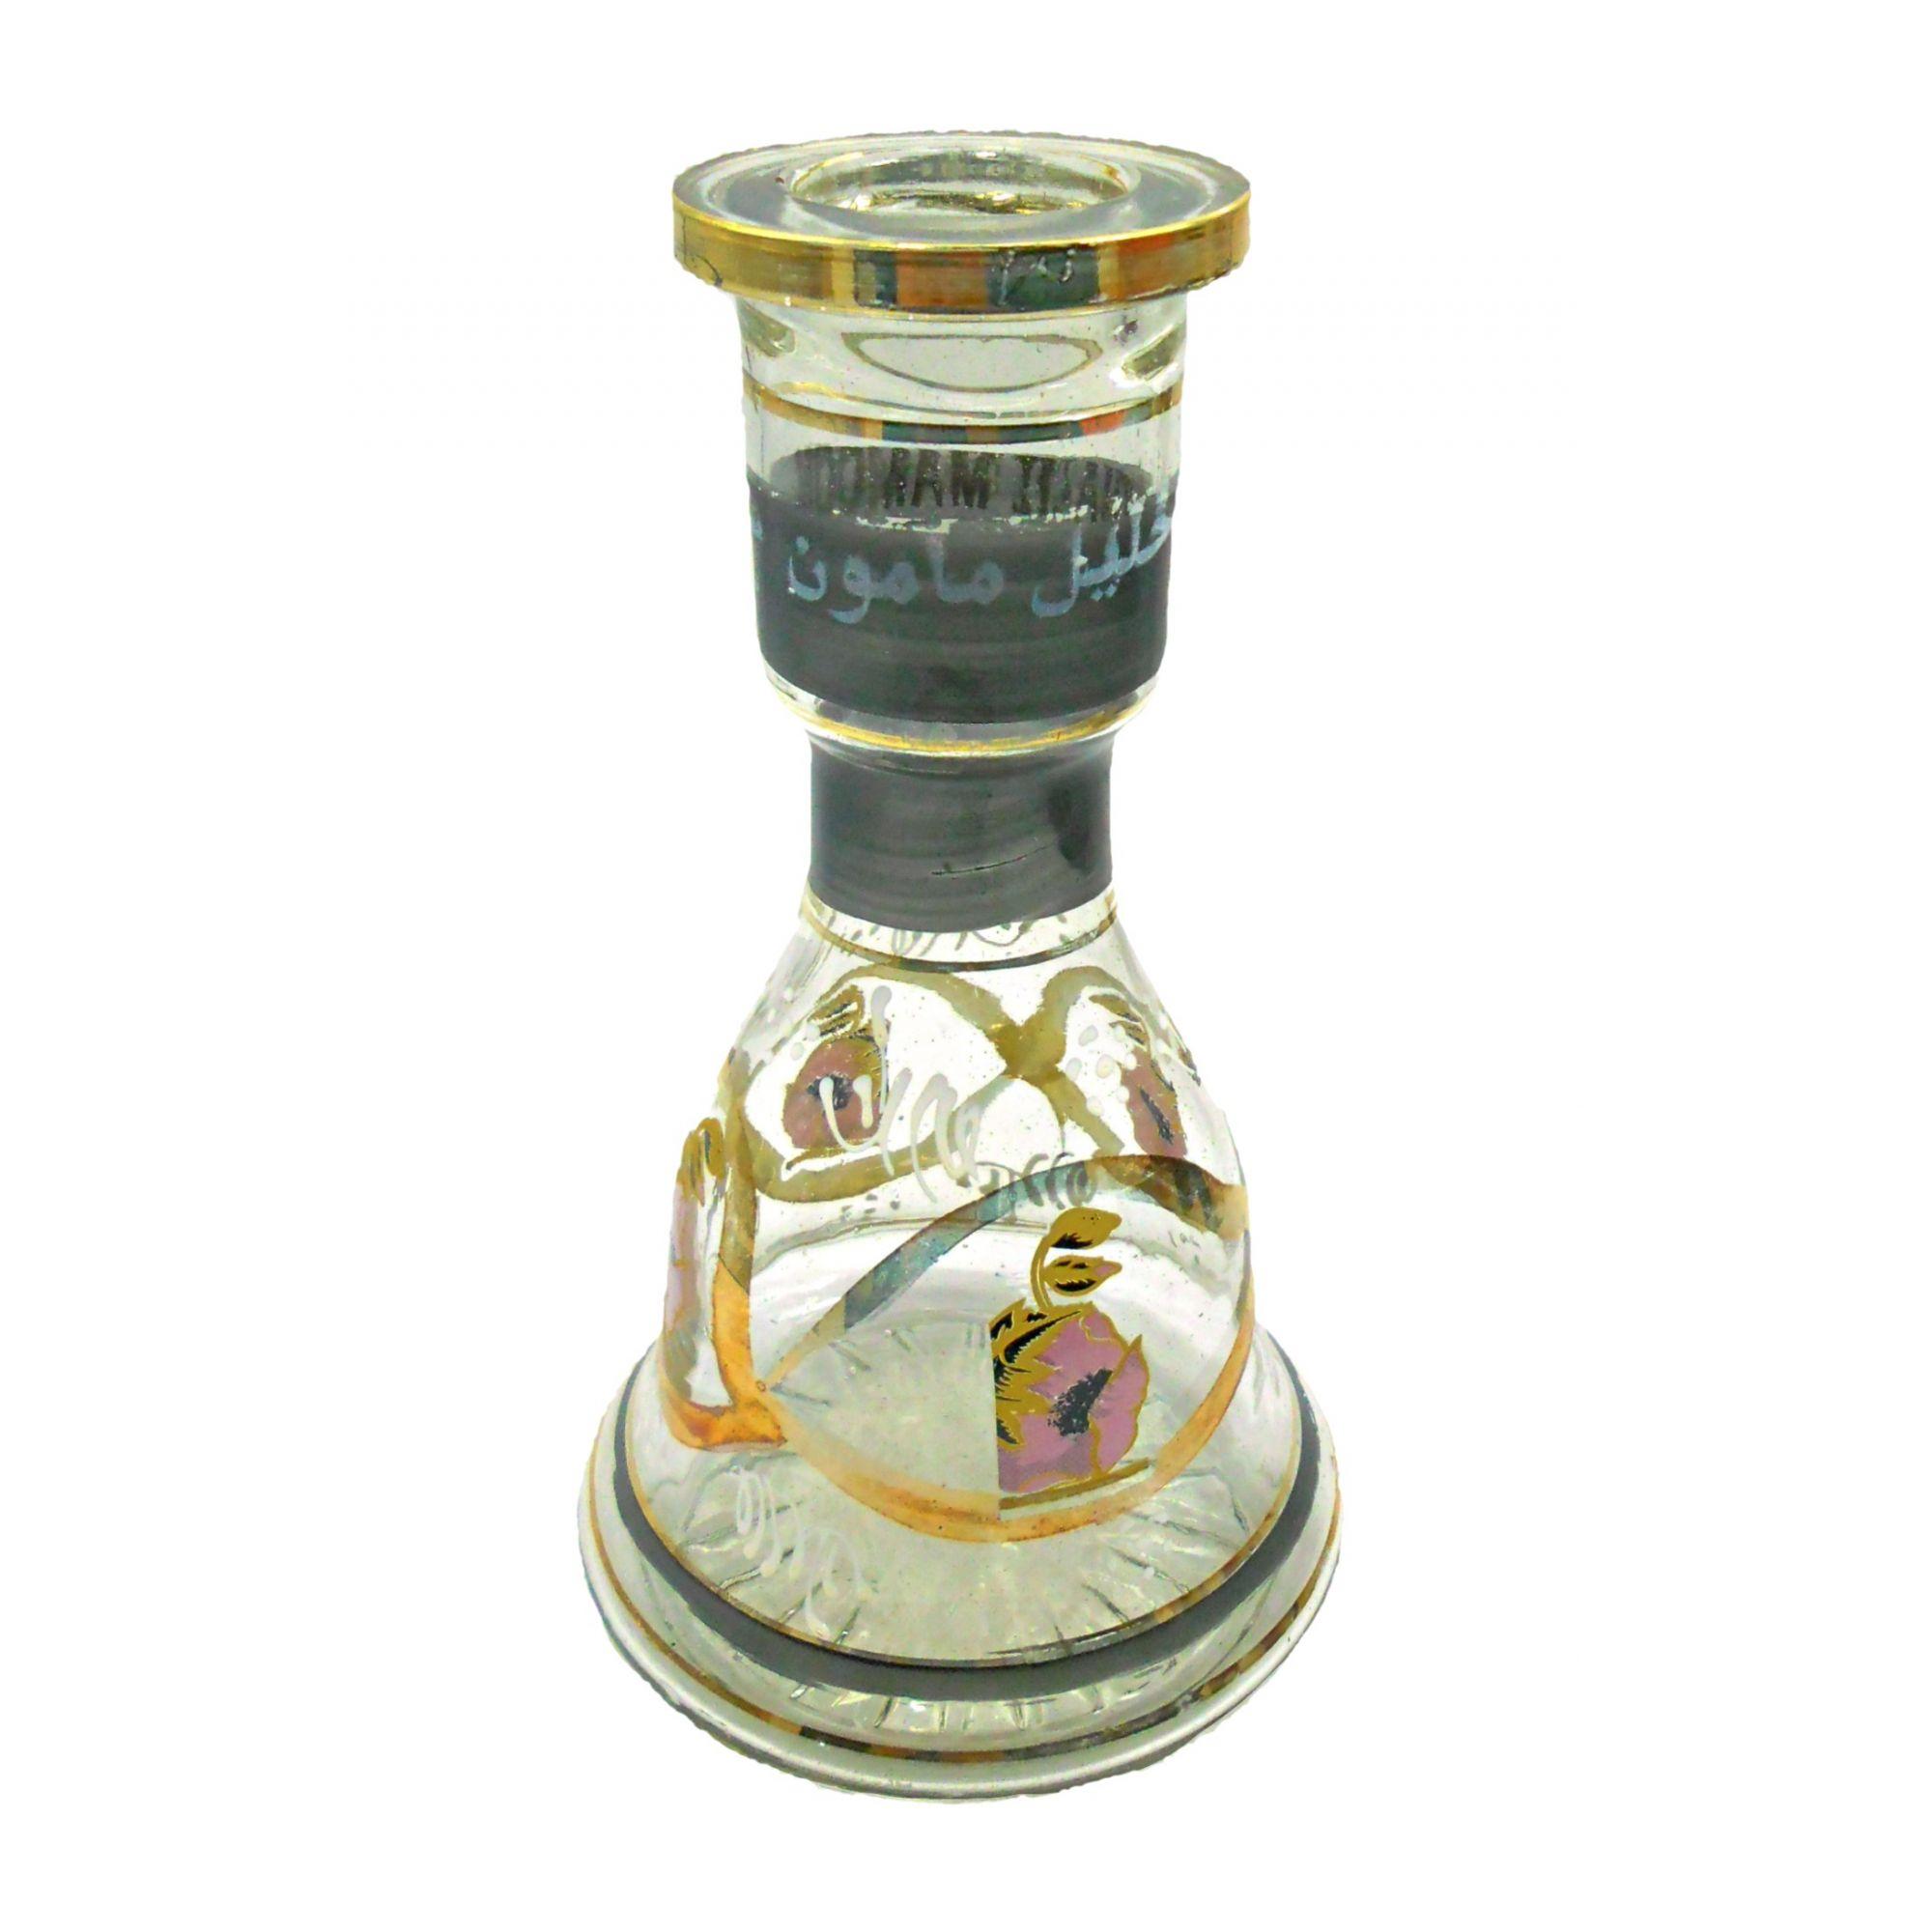 Vaso/base p/narguile em vidro c/pintura artesanal, LISTRA PRETA, egípcio Khalil Mammoon, SINO 22cm.